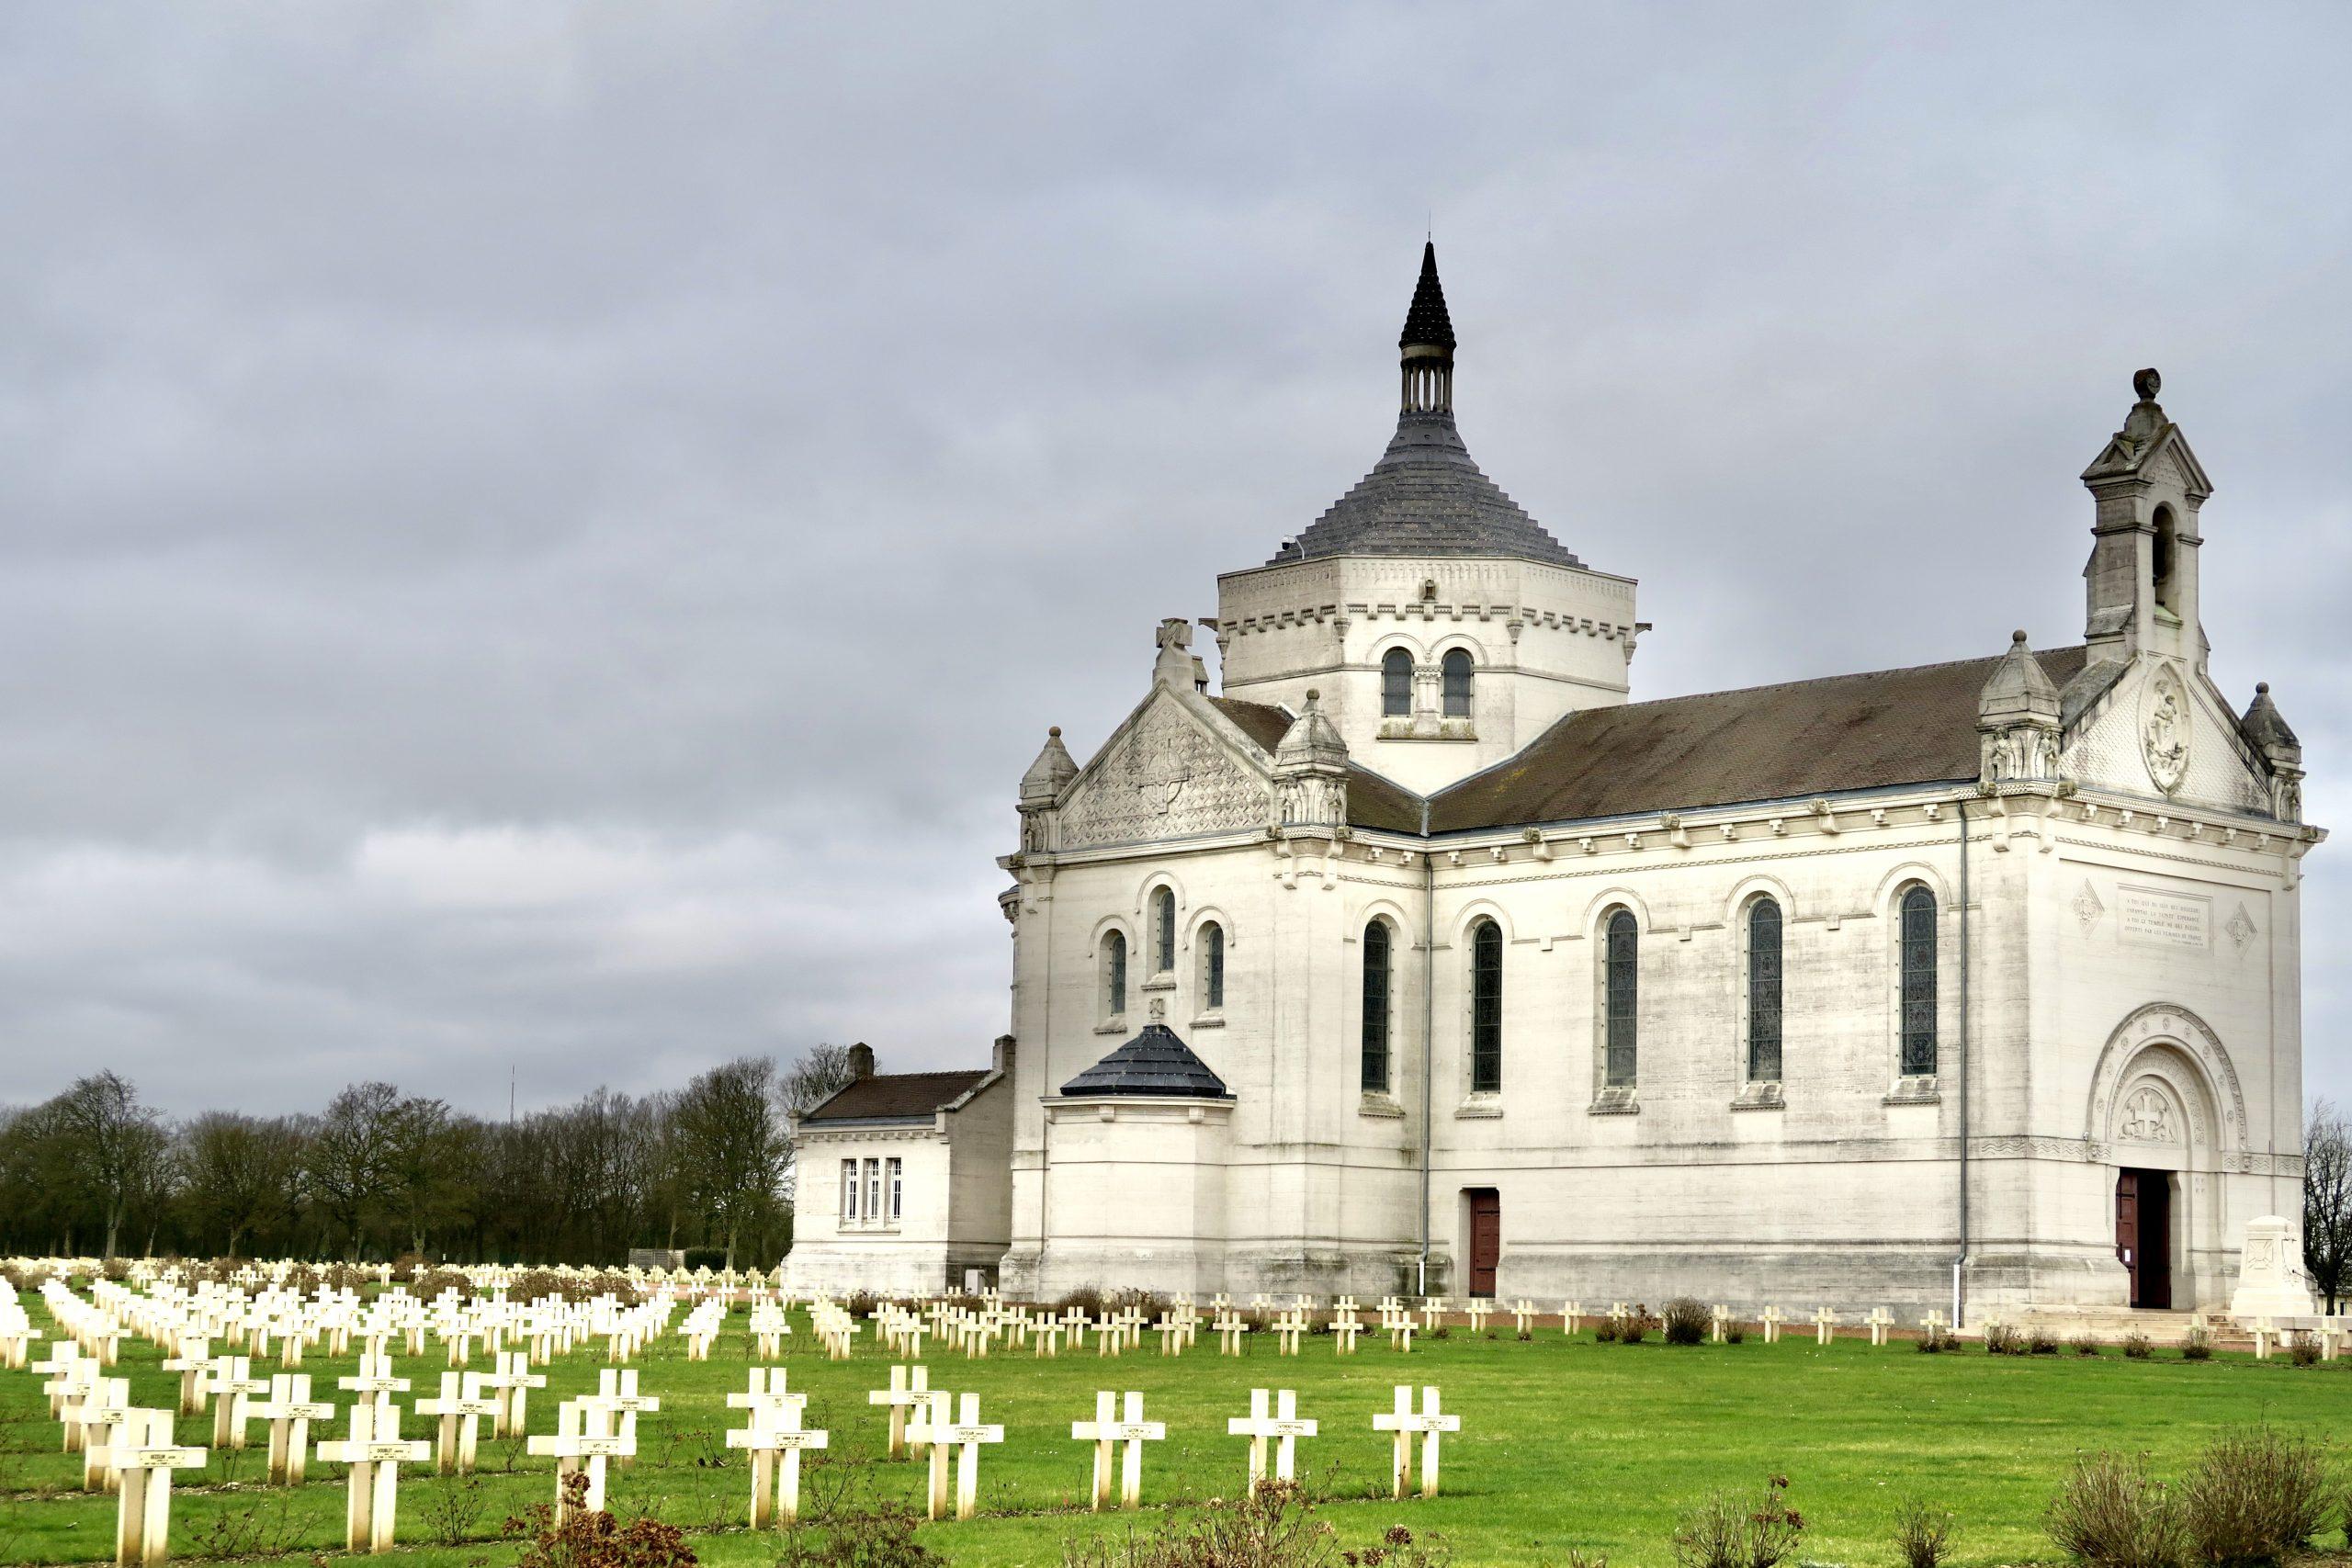 Notre-Dame-de-Lorette blog kikimagtravel